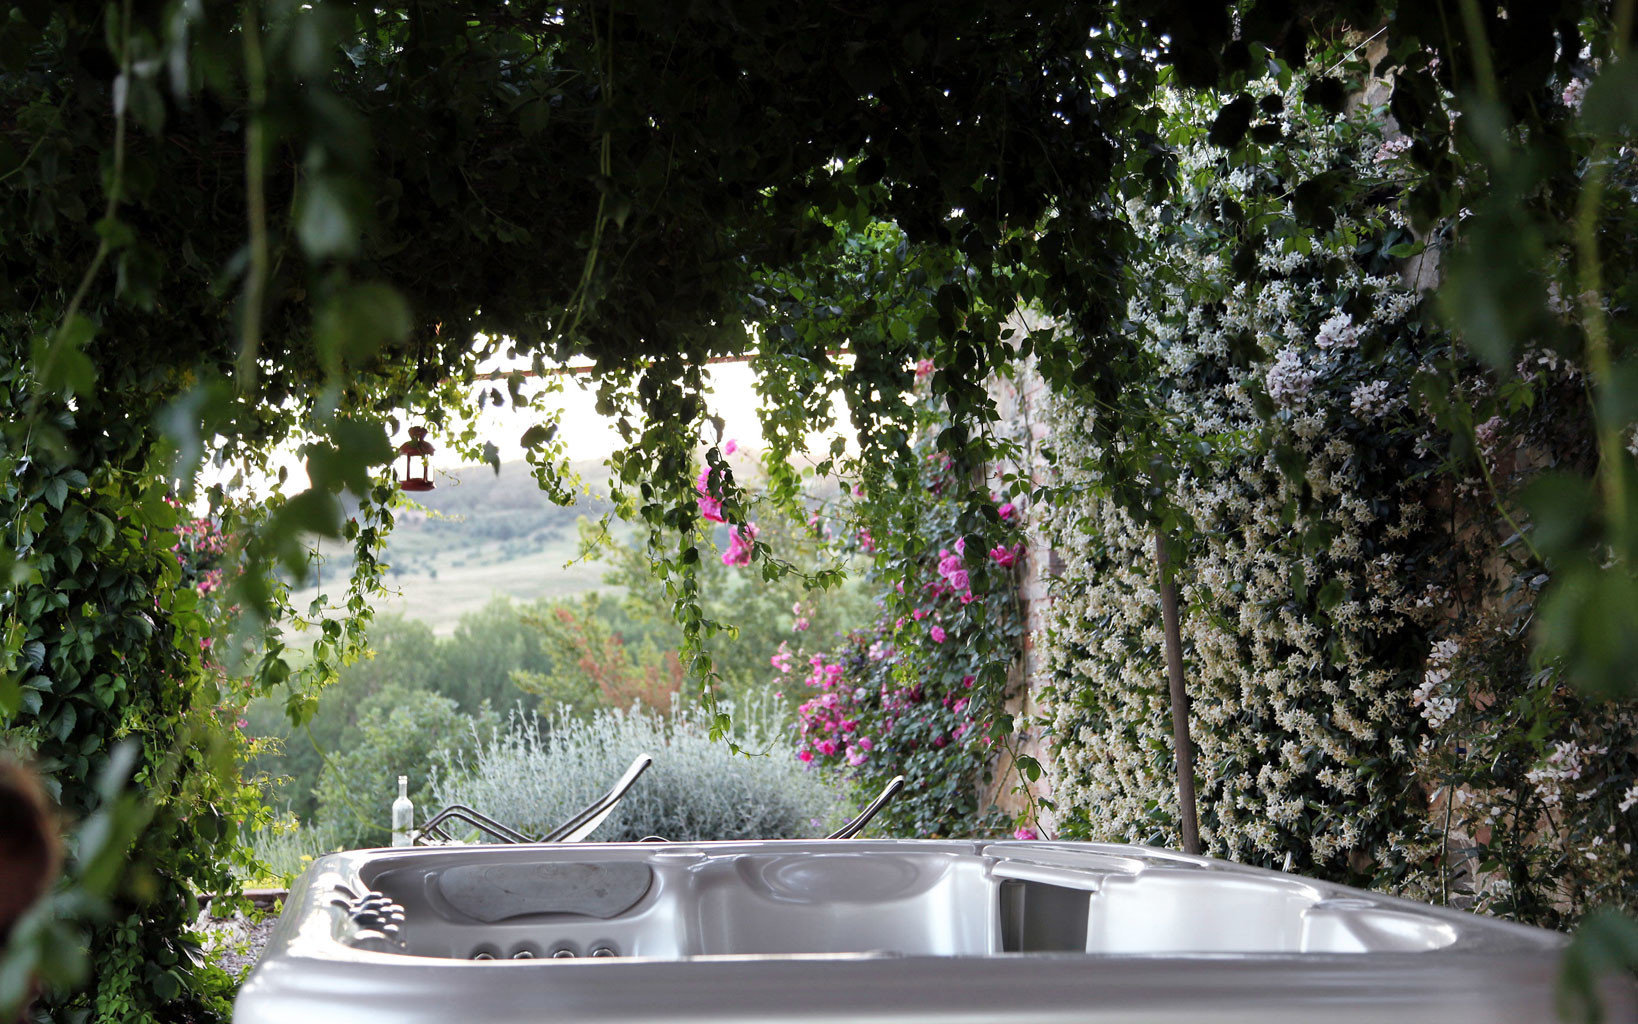 B&B Hot tub Hot tub/Jacuzzi Luxury Romance Romantic tree green Garden flora botany backyard flower swimming pool leaf yard plant woodland